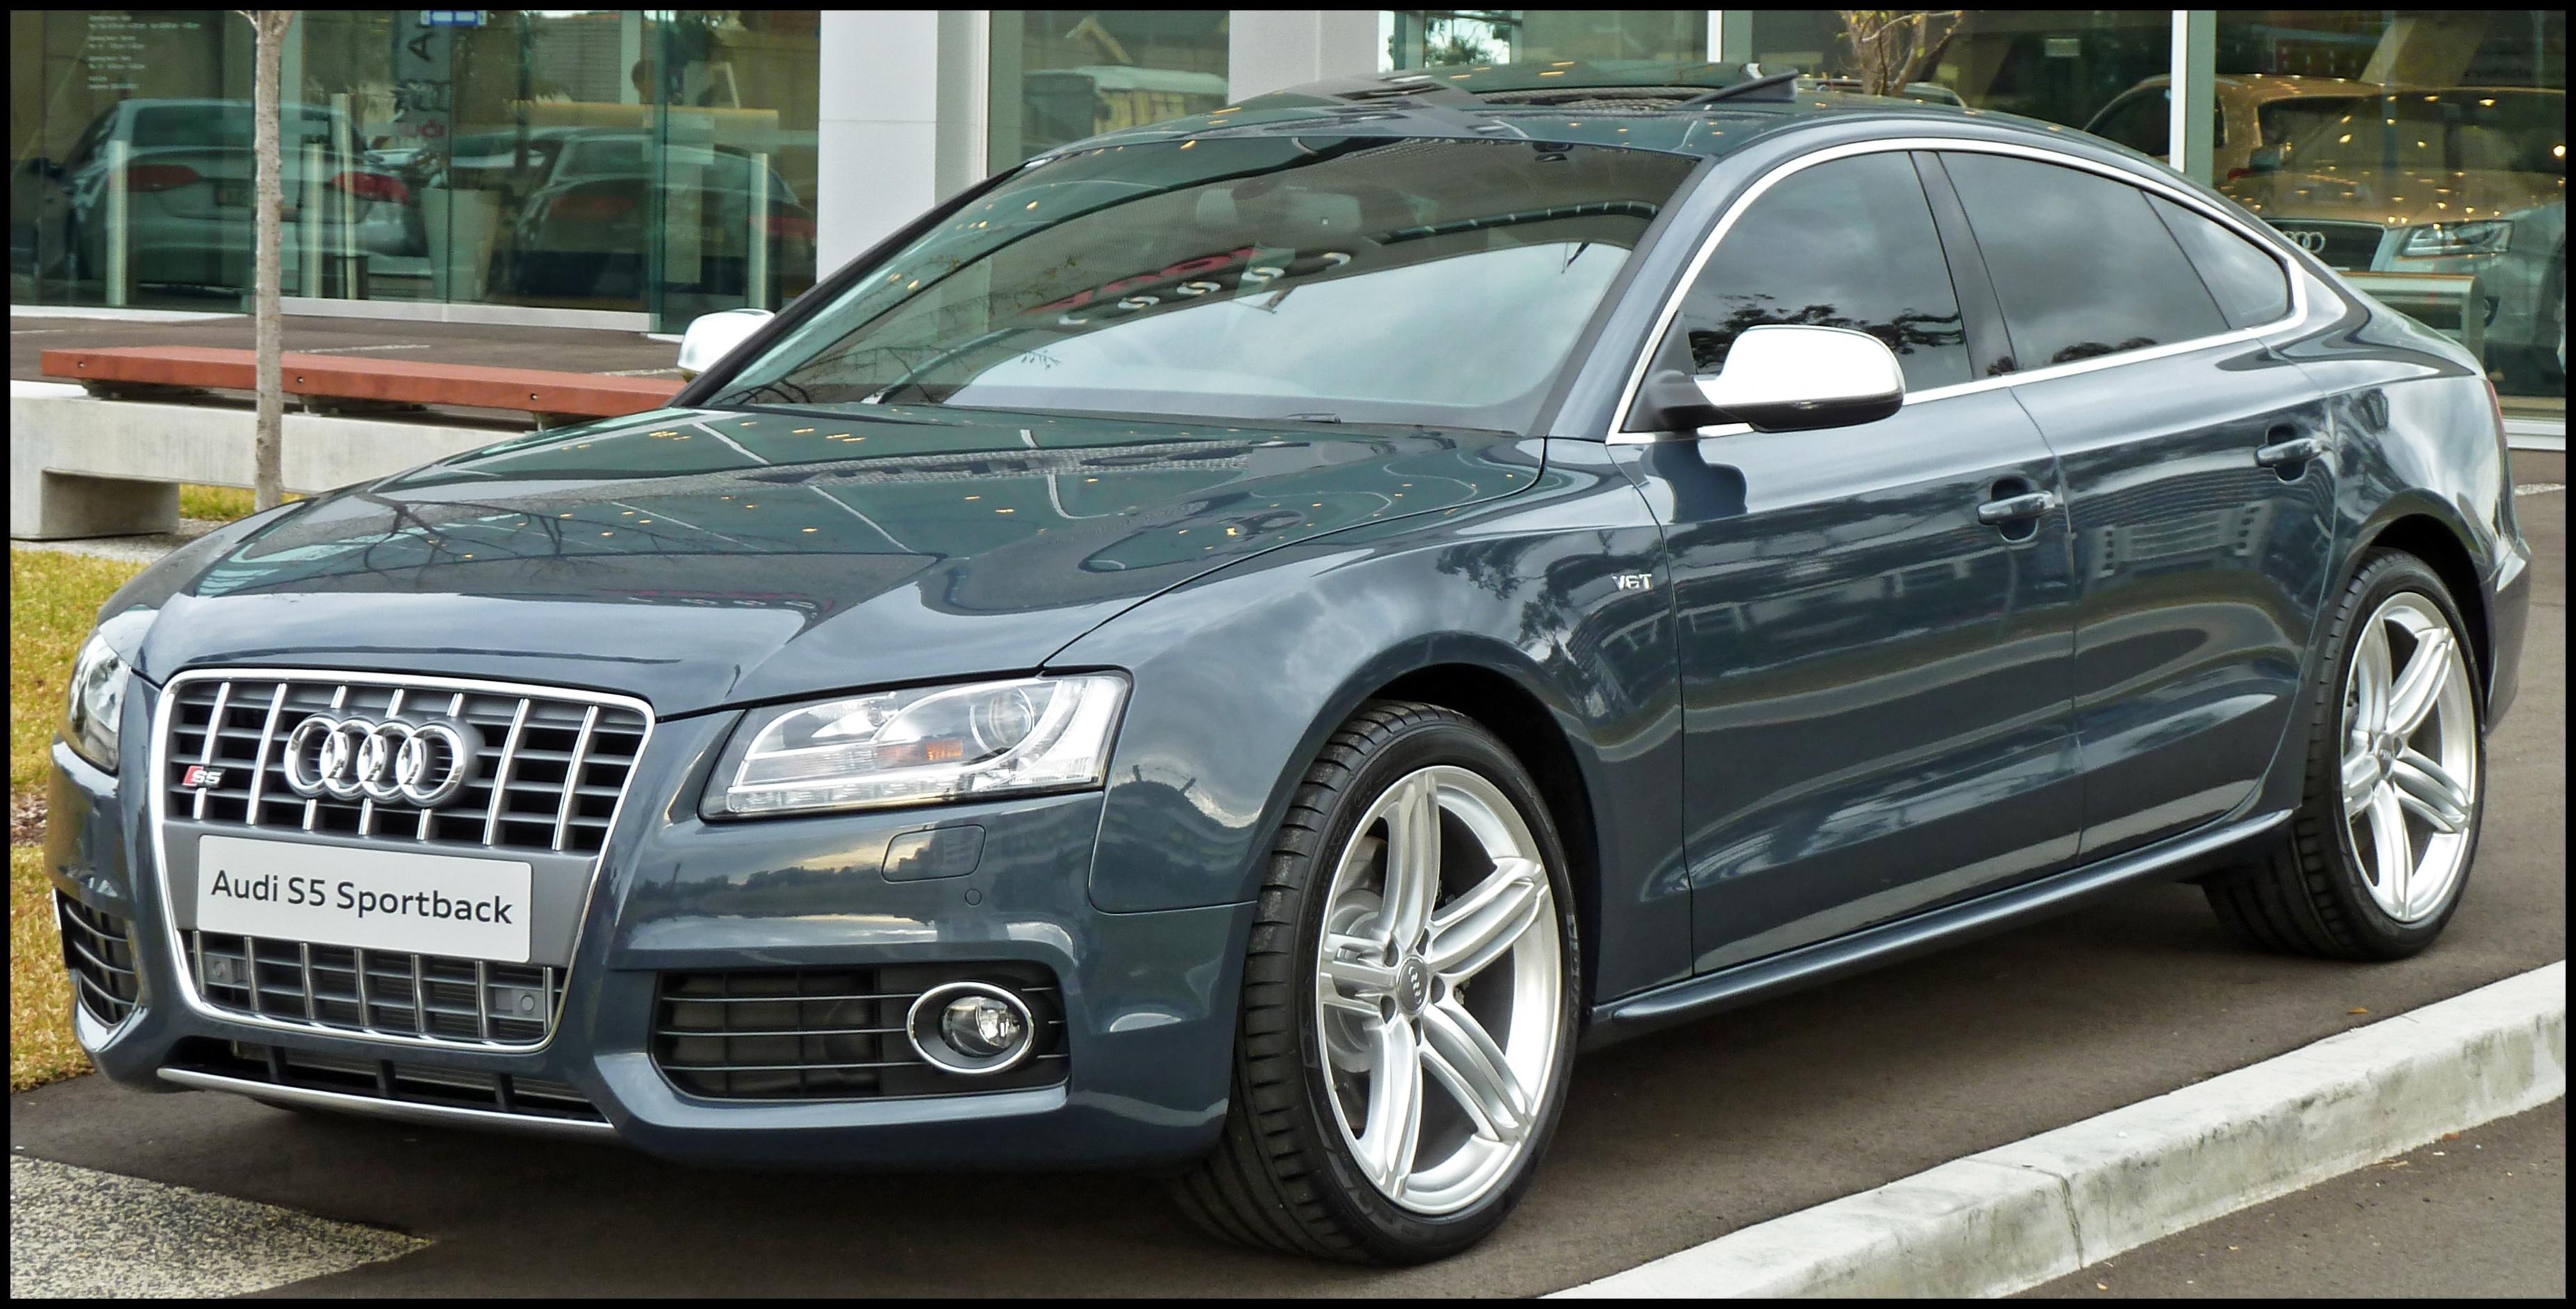 Audi S5 Wiki The Best Choice Car